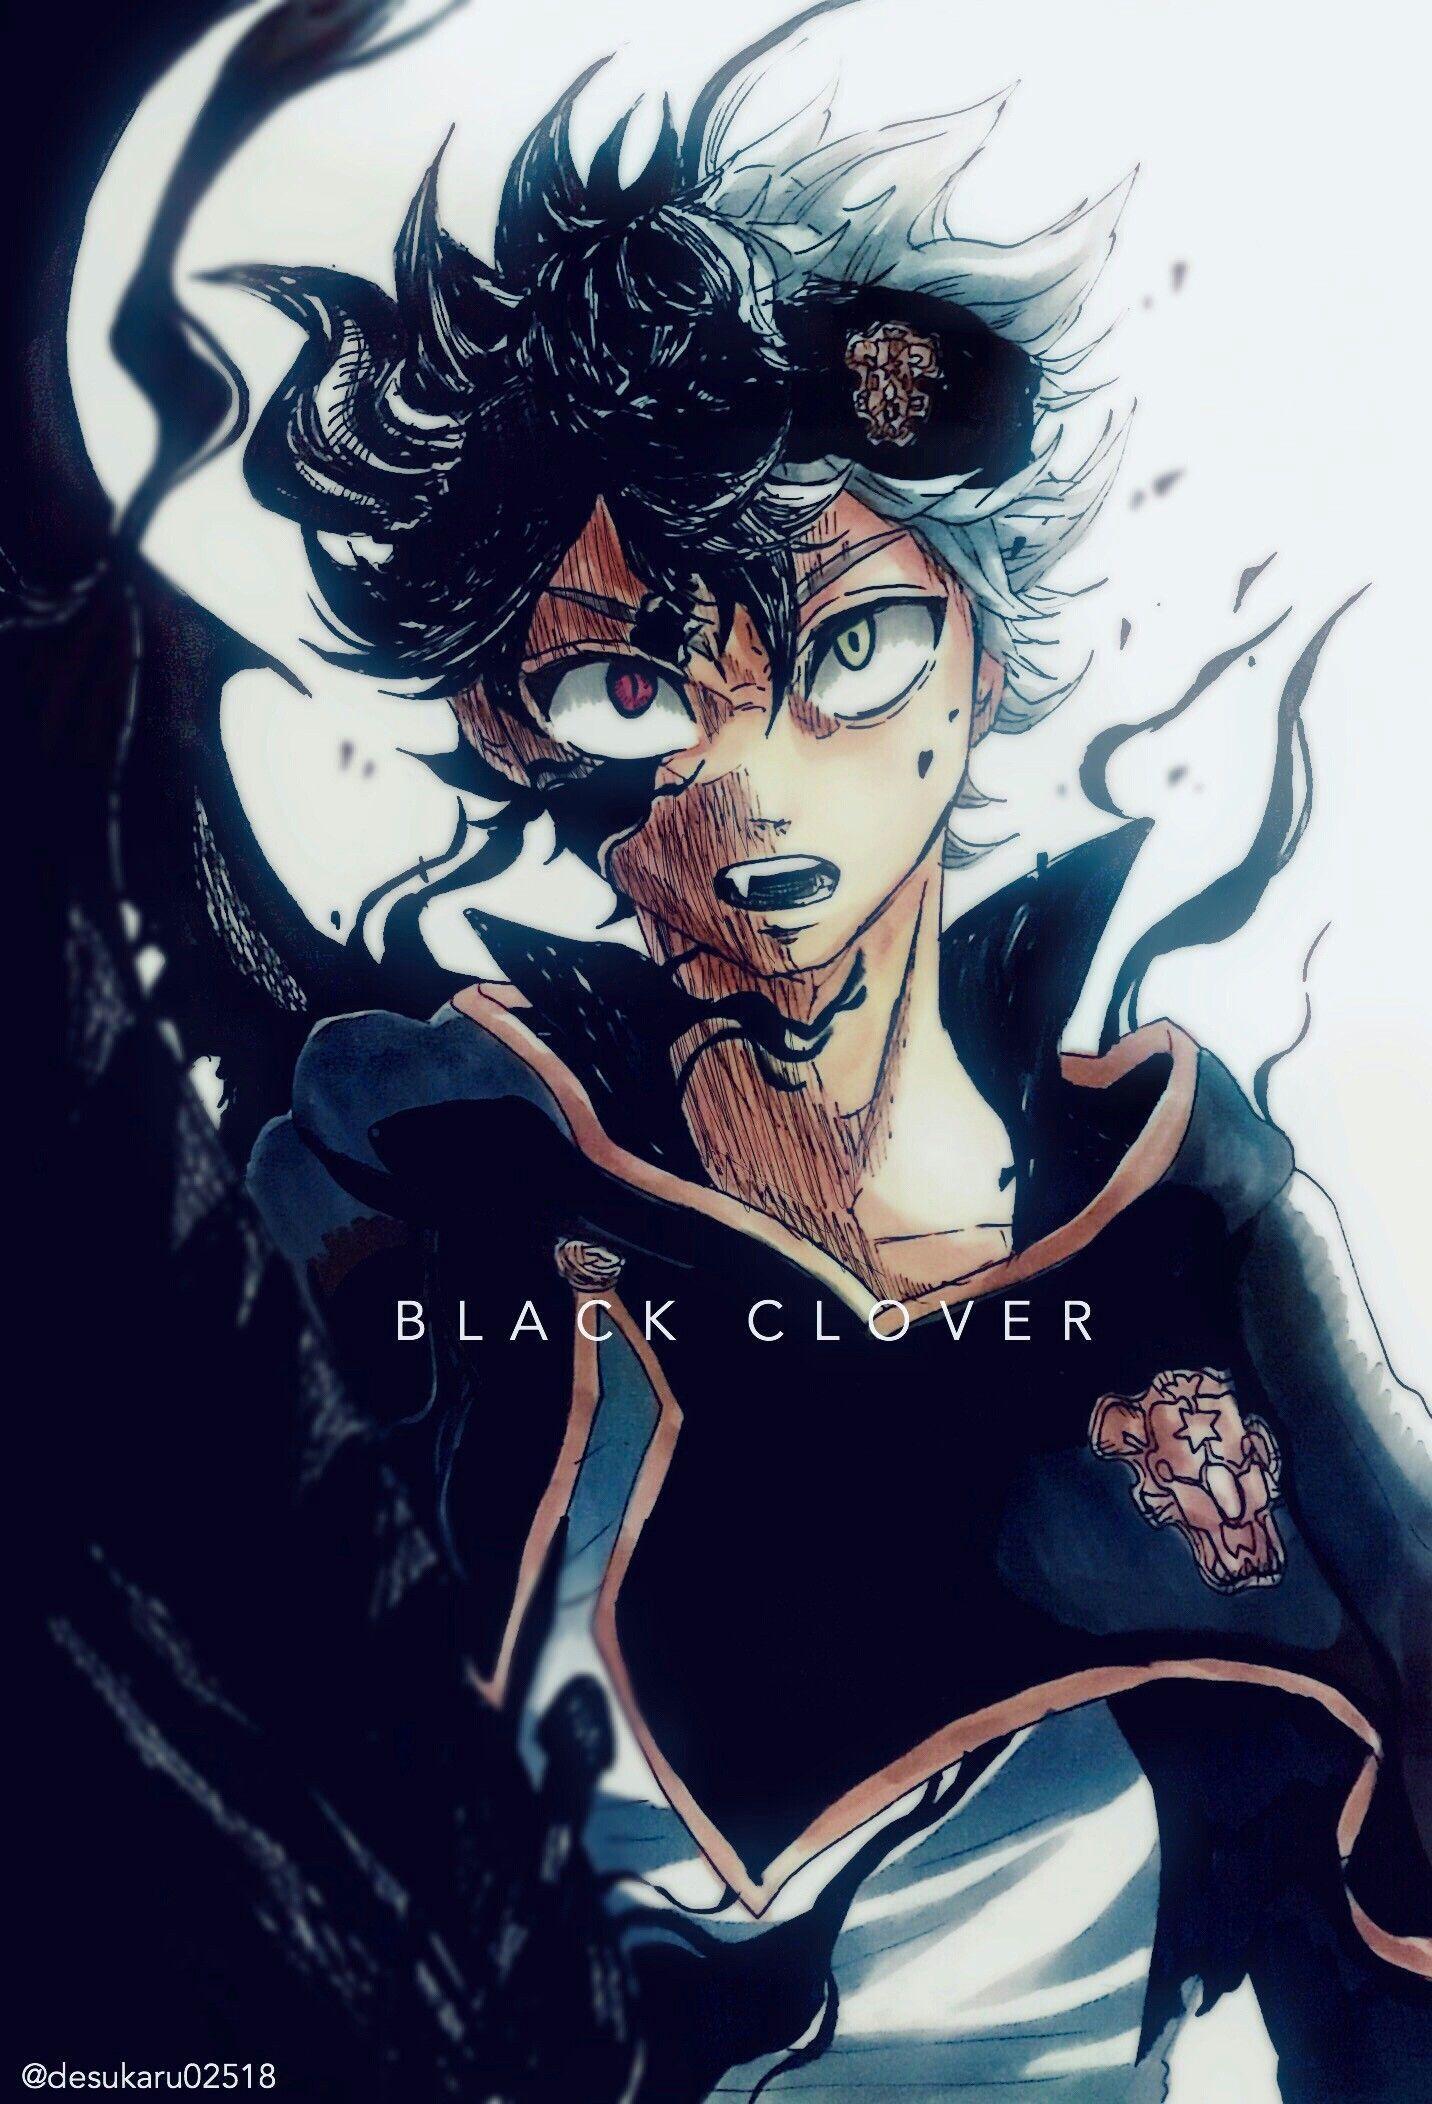 Black Clover Wallpapers Top Free Black Clover Backgrounds